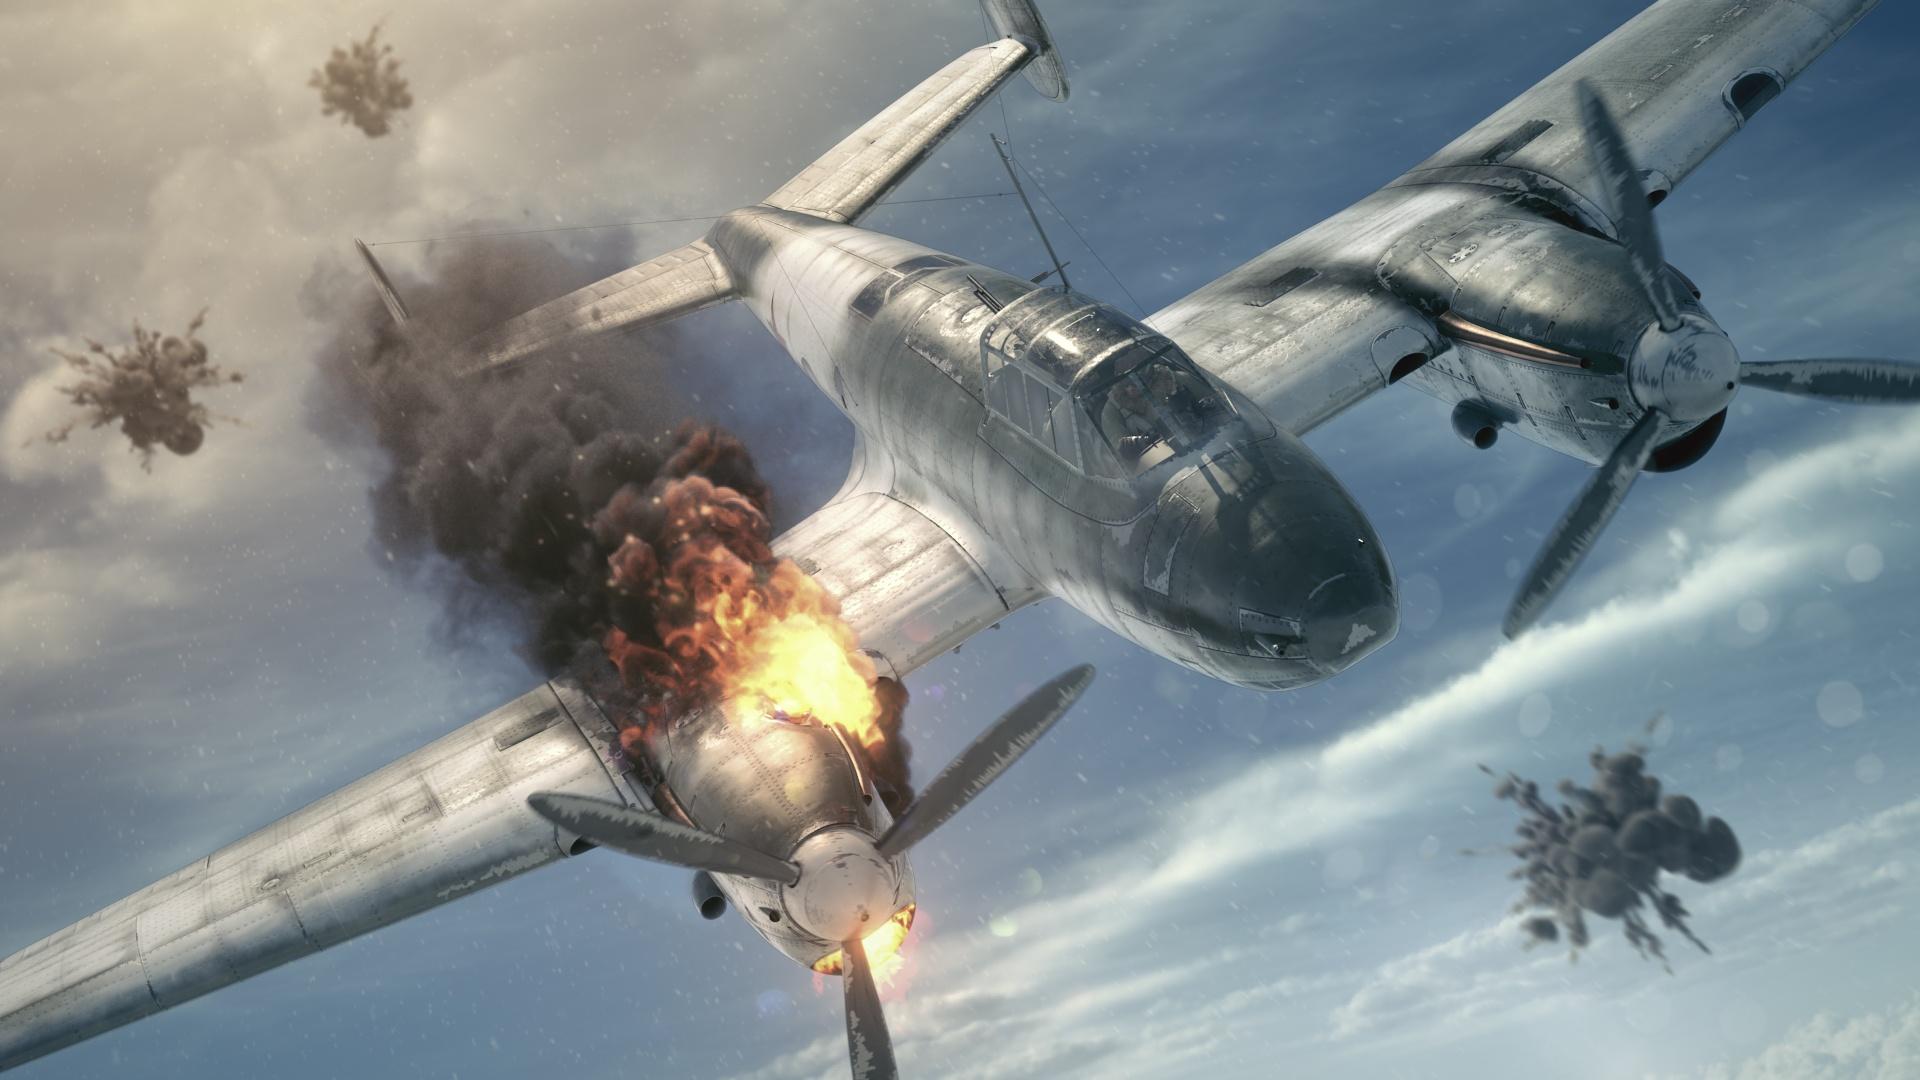 IL-2 Sturmovik: Battle Of Stalingrad Pics, Video Game Collection